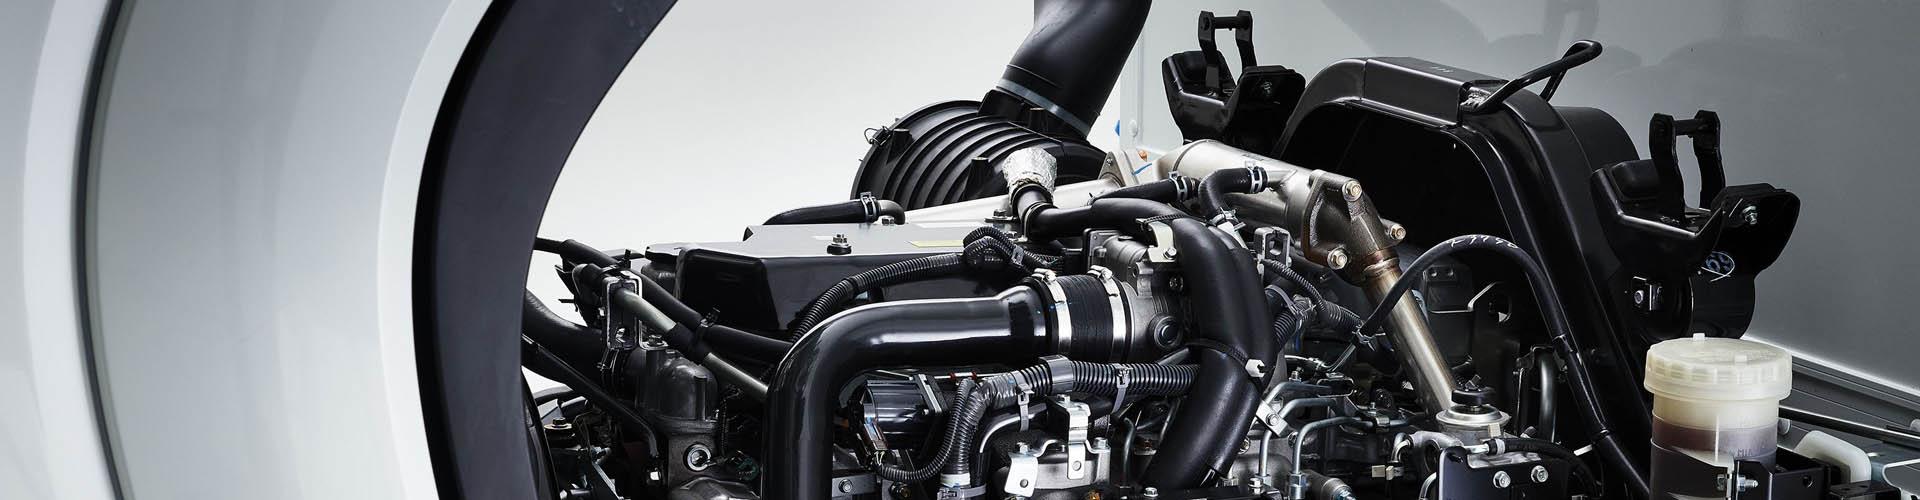 IsuzuTrucks-PB-Engine-02-Dec19